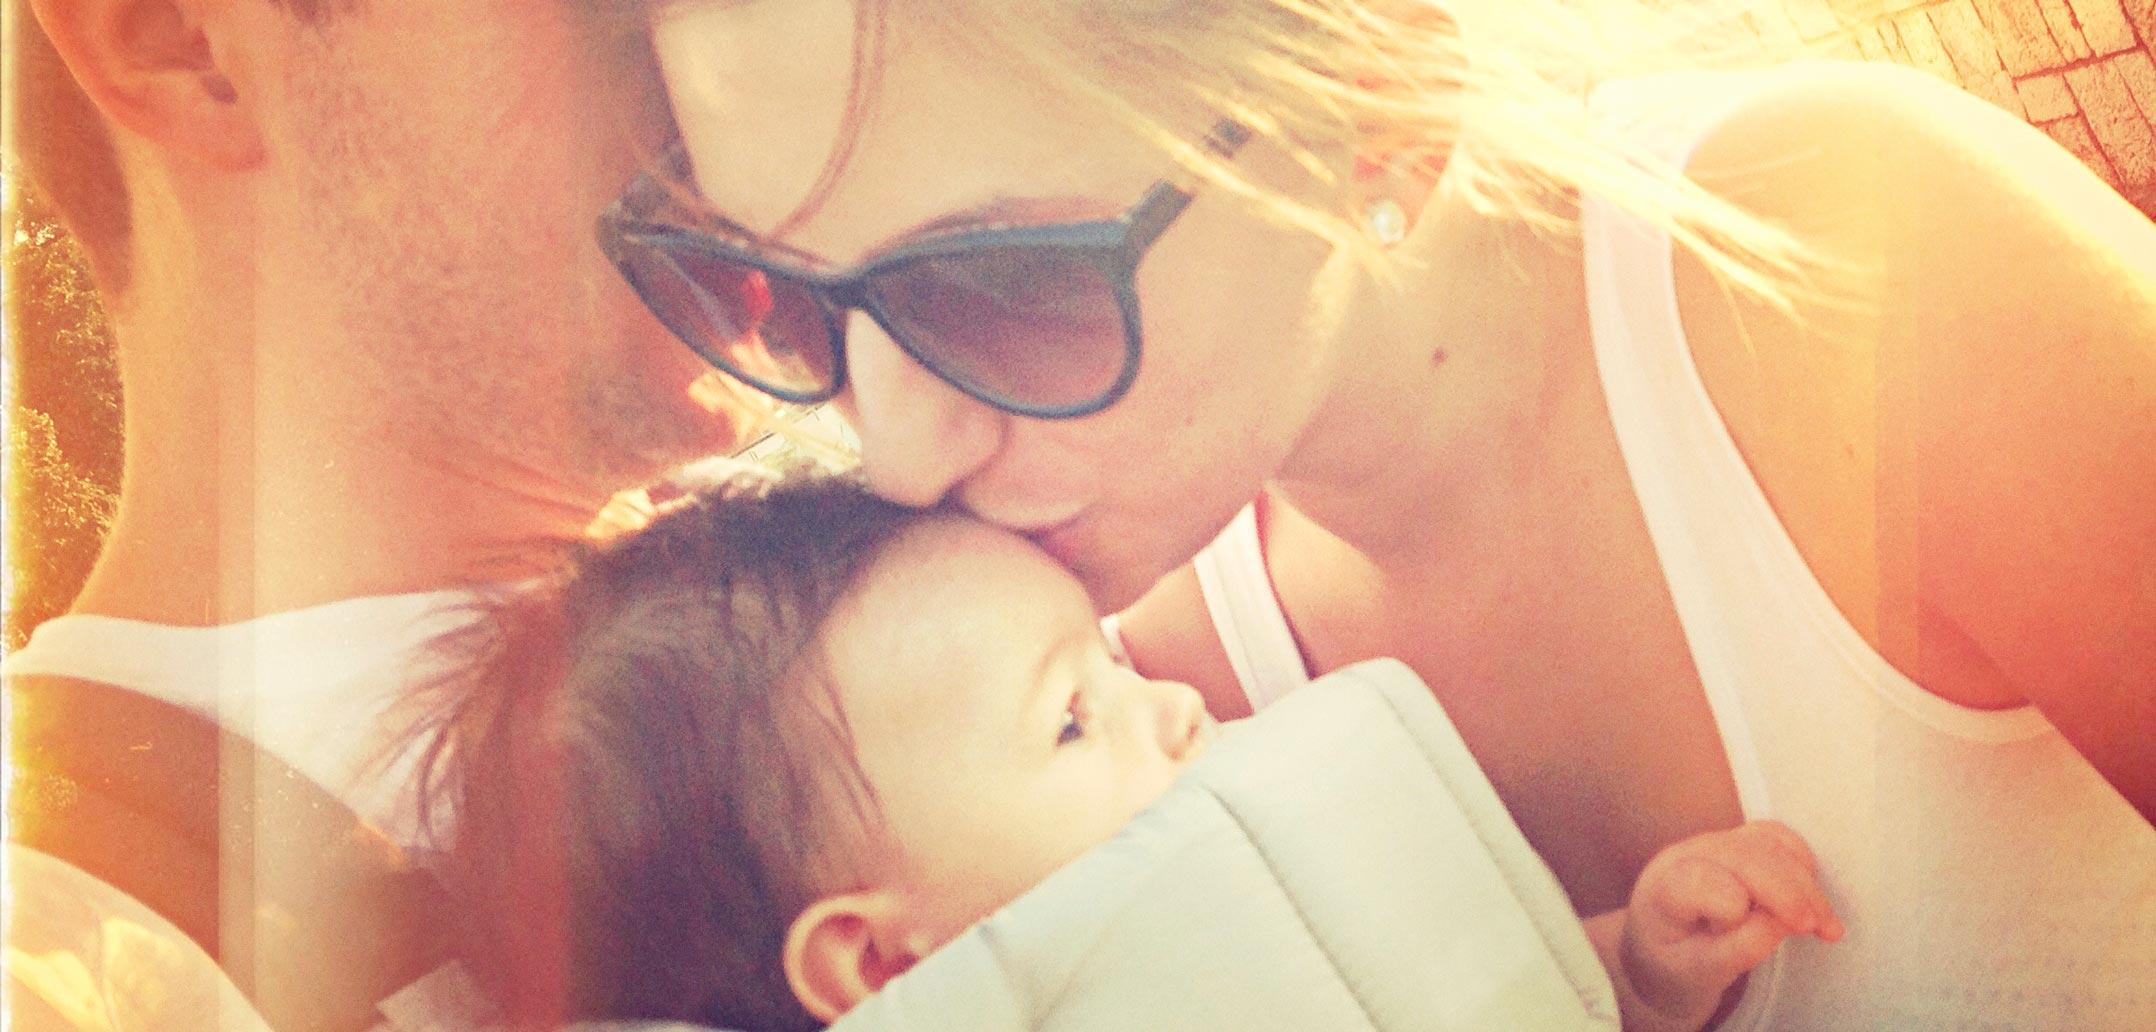 Perfekt Kinder ohne perfekte Eltern